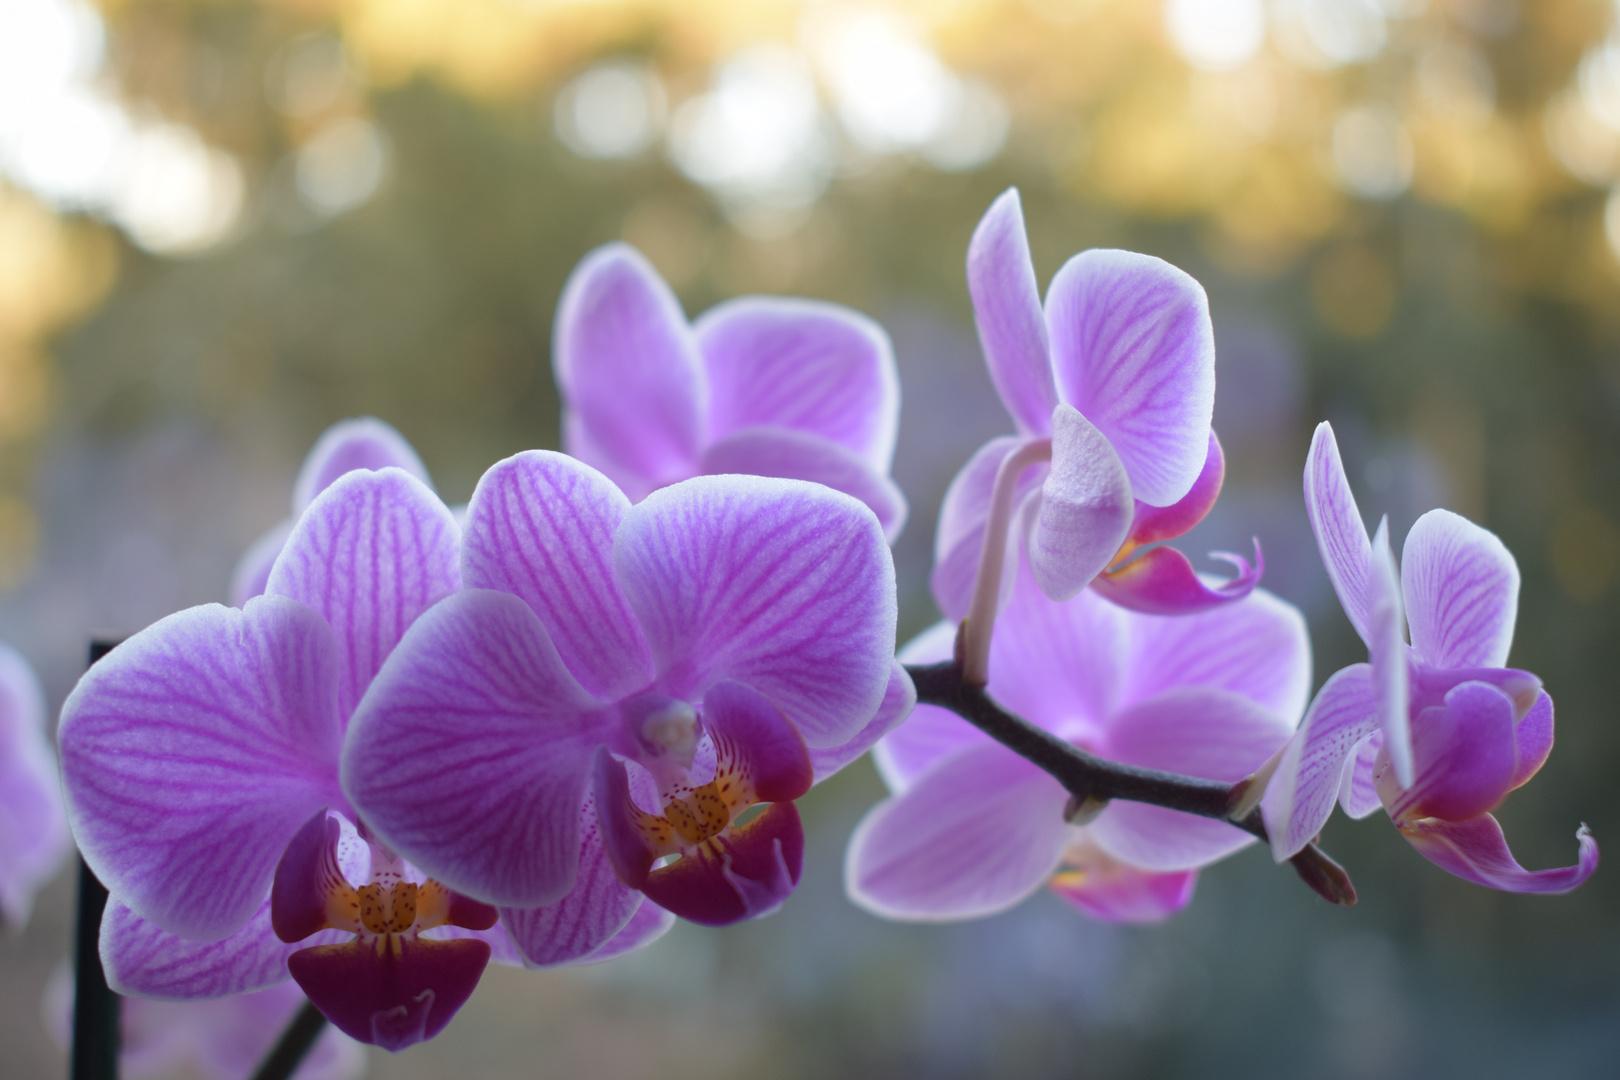 Orchidee flavor - Insta: MaximusSk